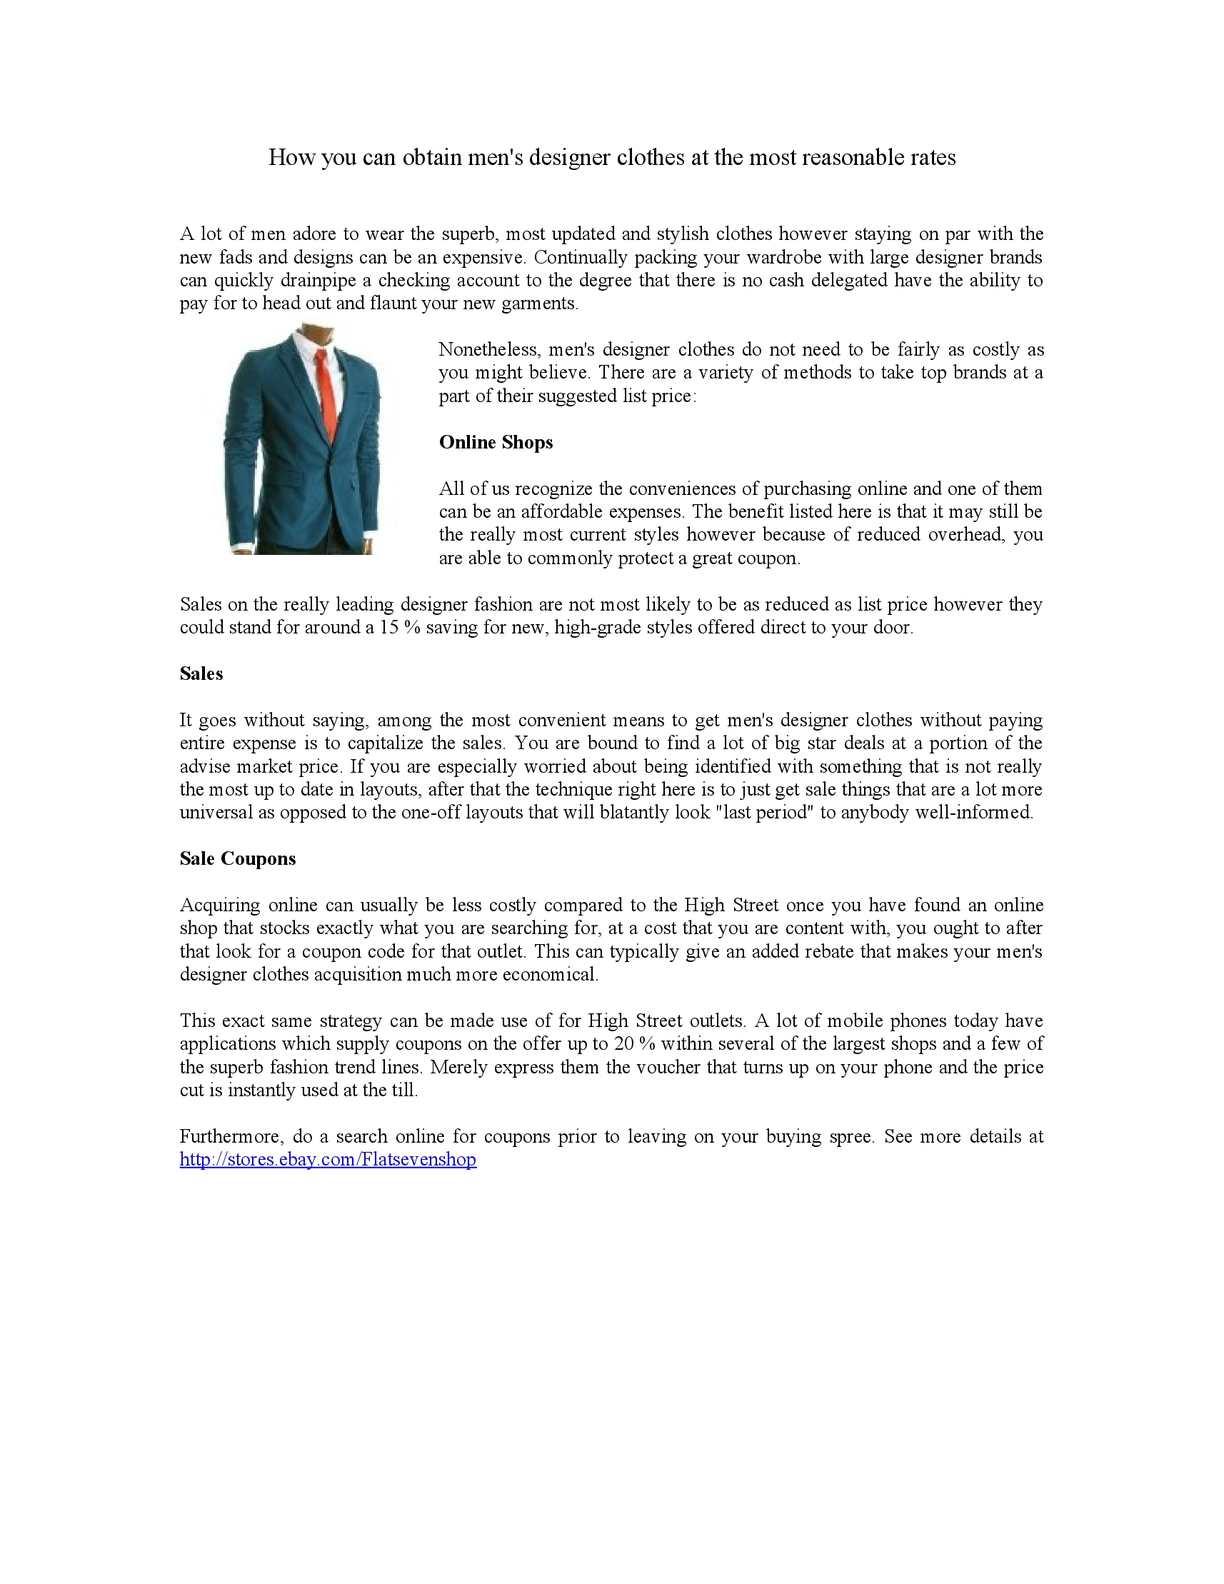 Cheap Mens Designer Clothing Websites